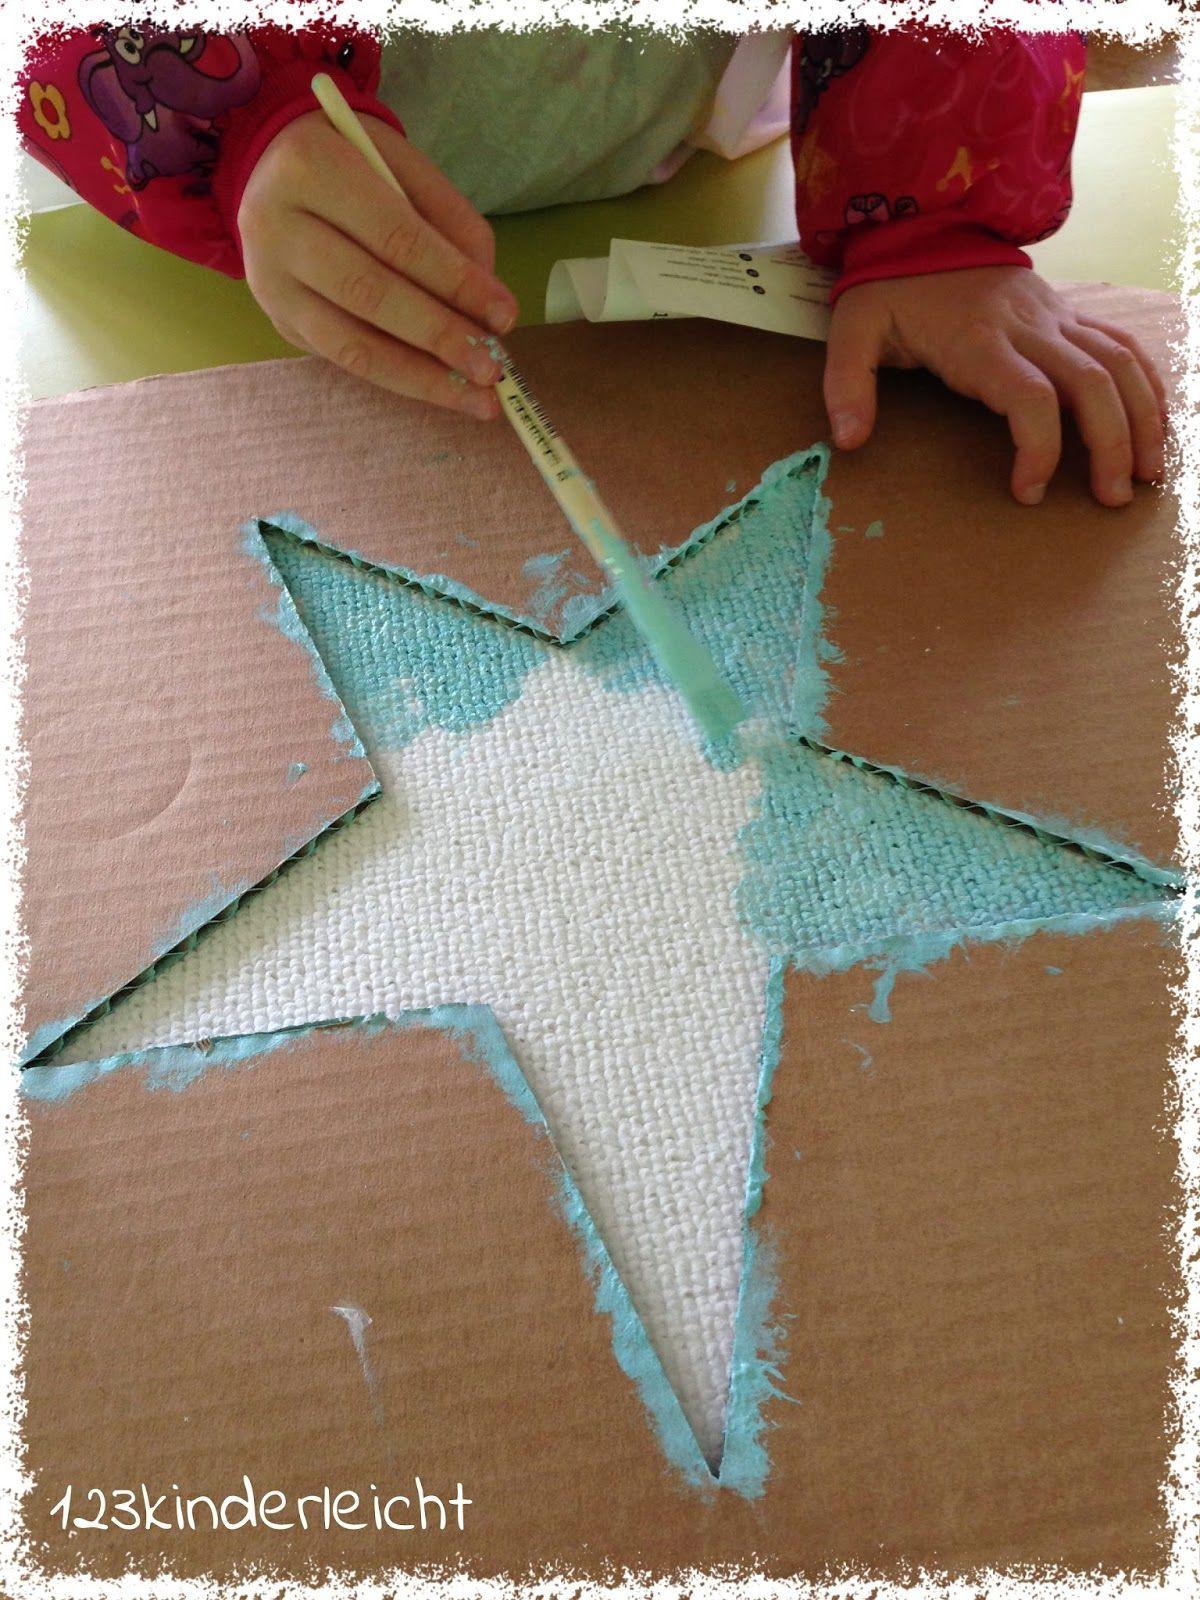 123 kinderleicht kinderleicht blog kindergarten kindergartenblog